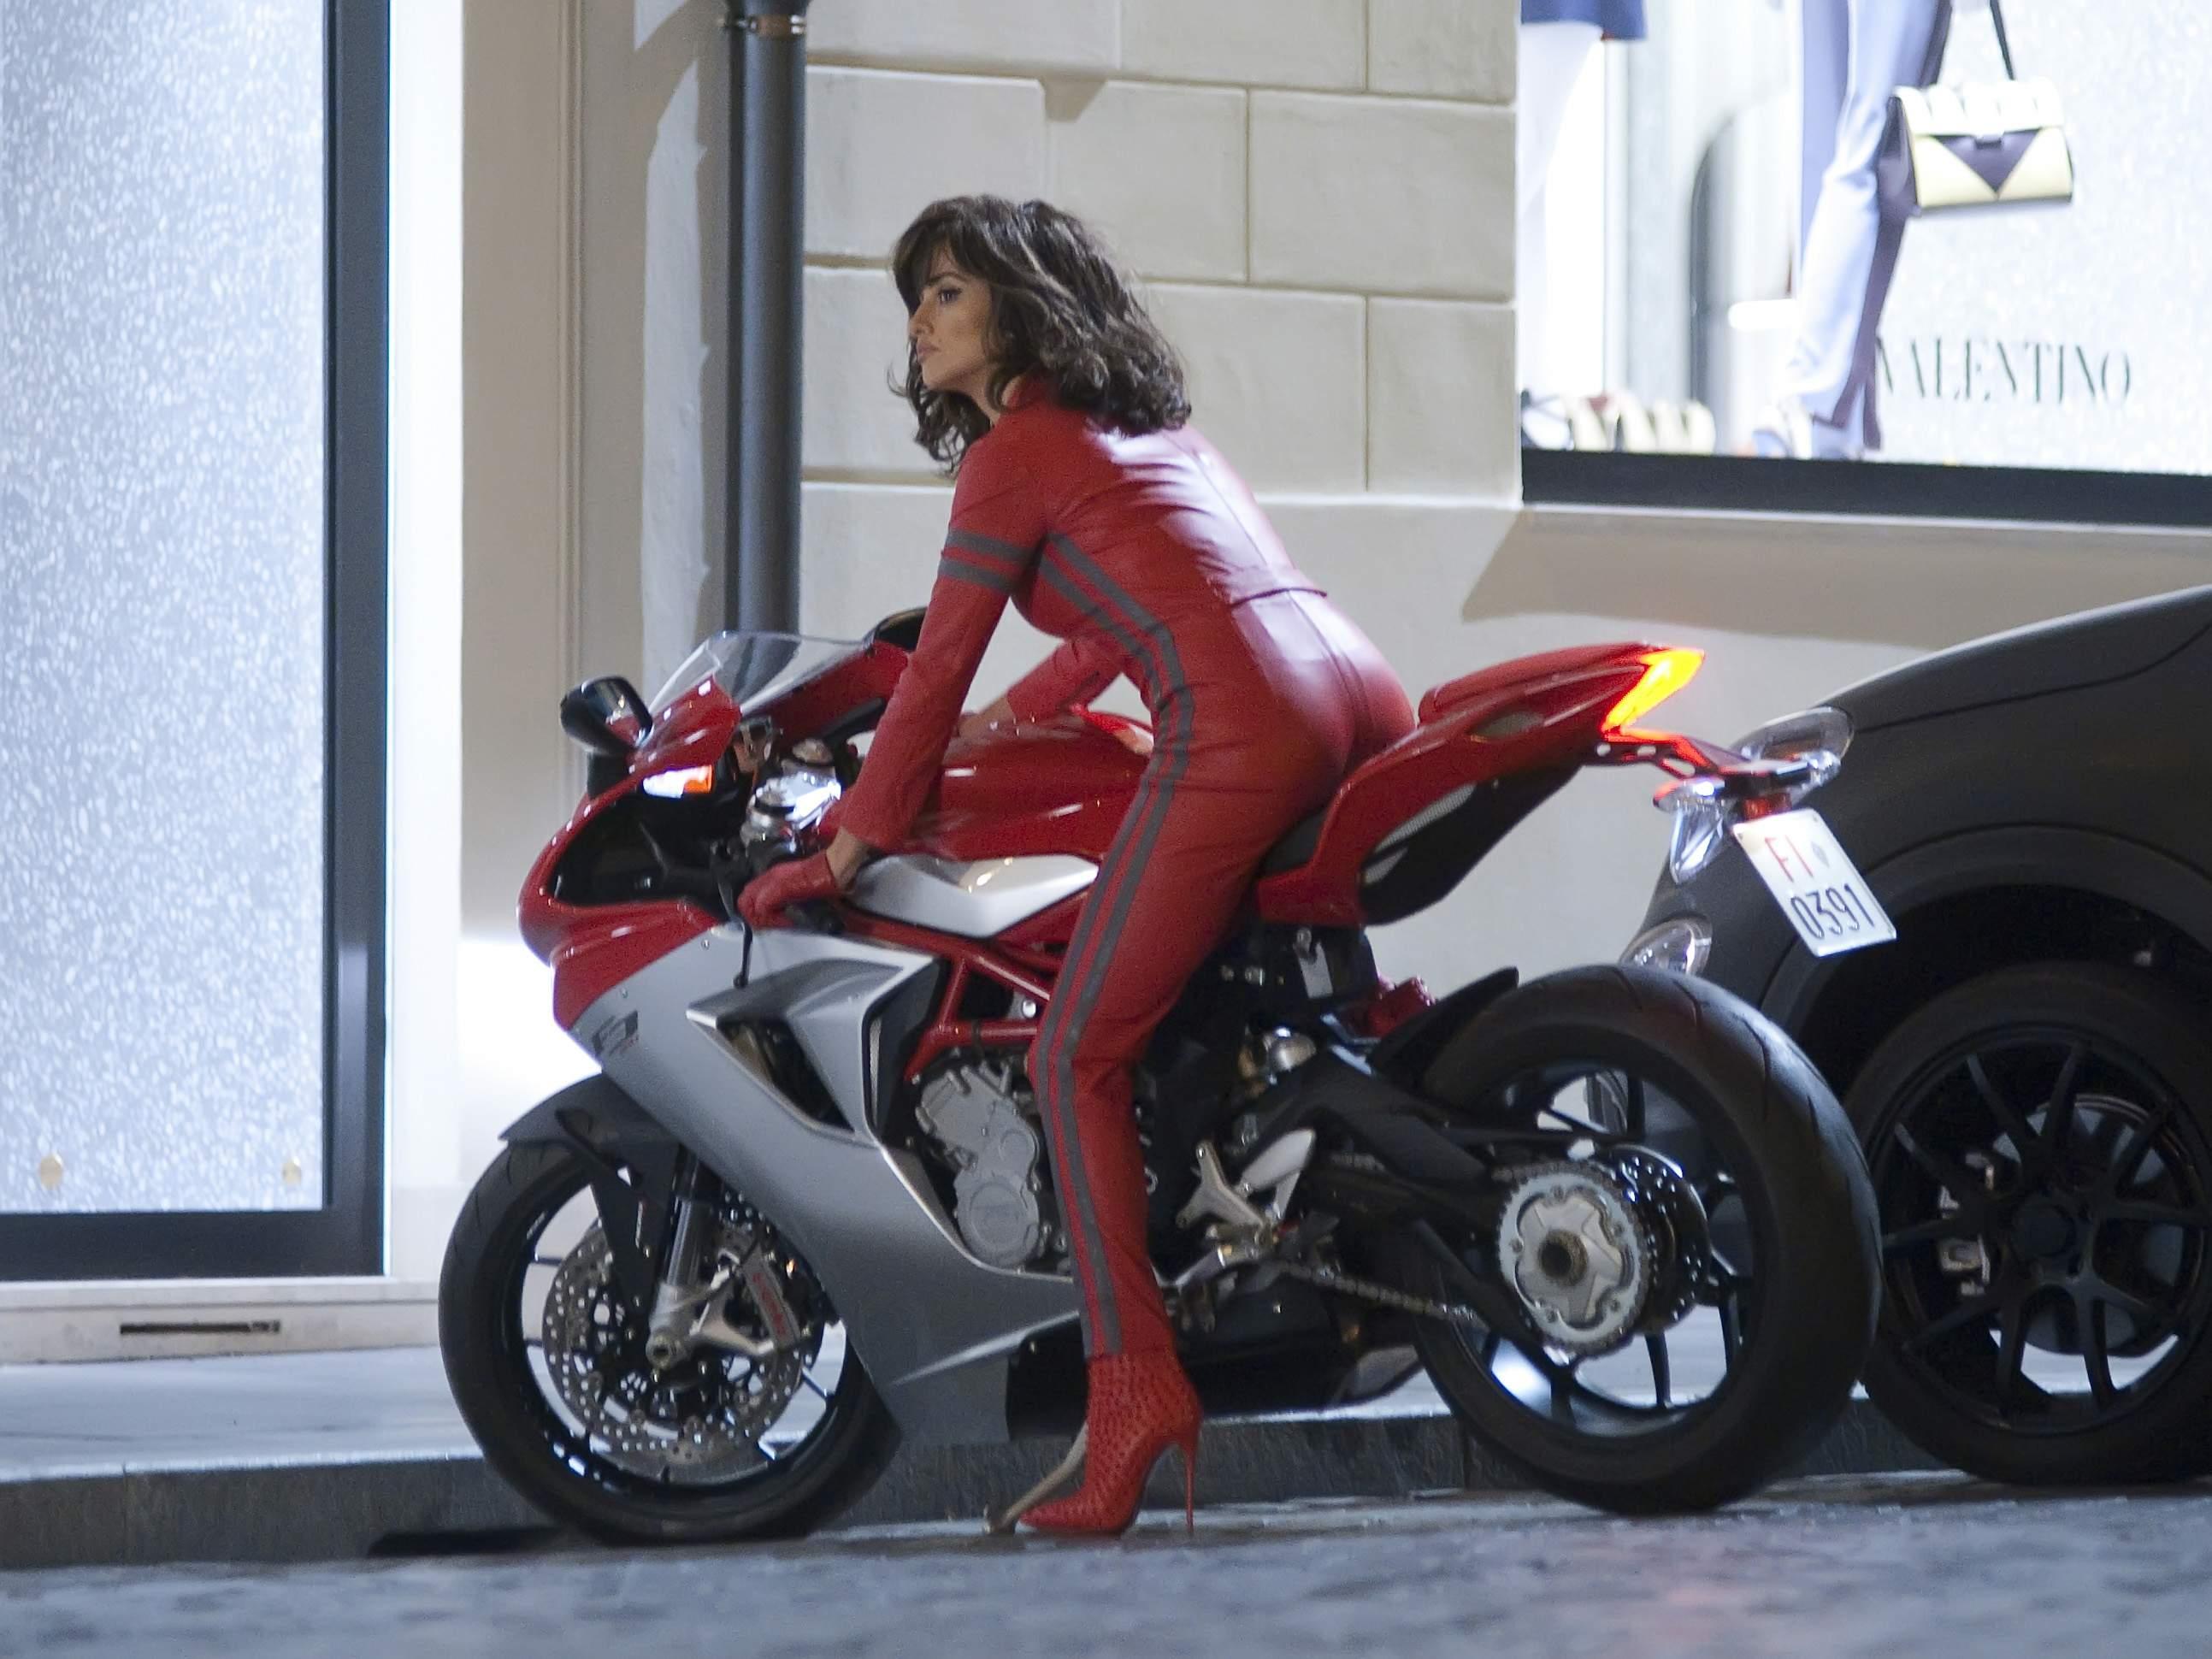 Penelope Cruz Filming scenes for Zoolander 2